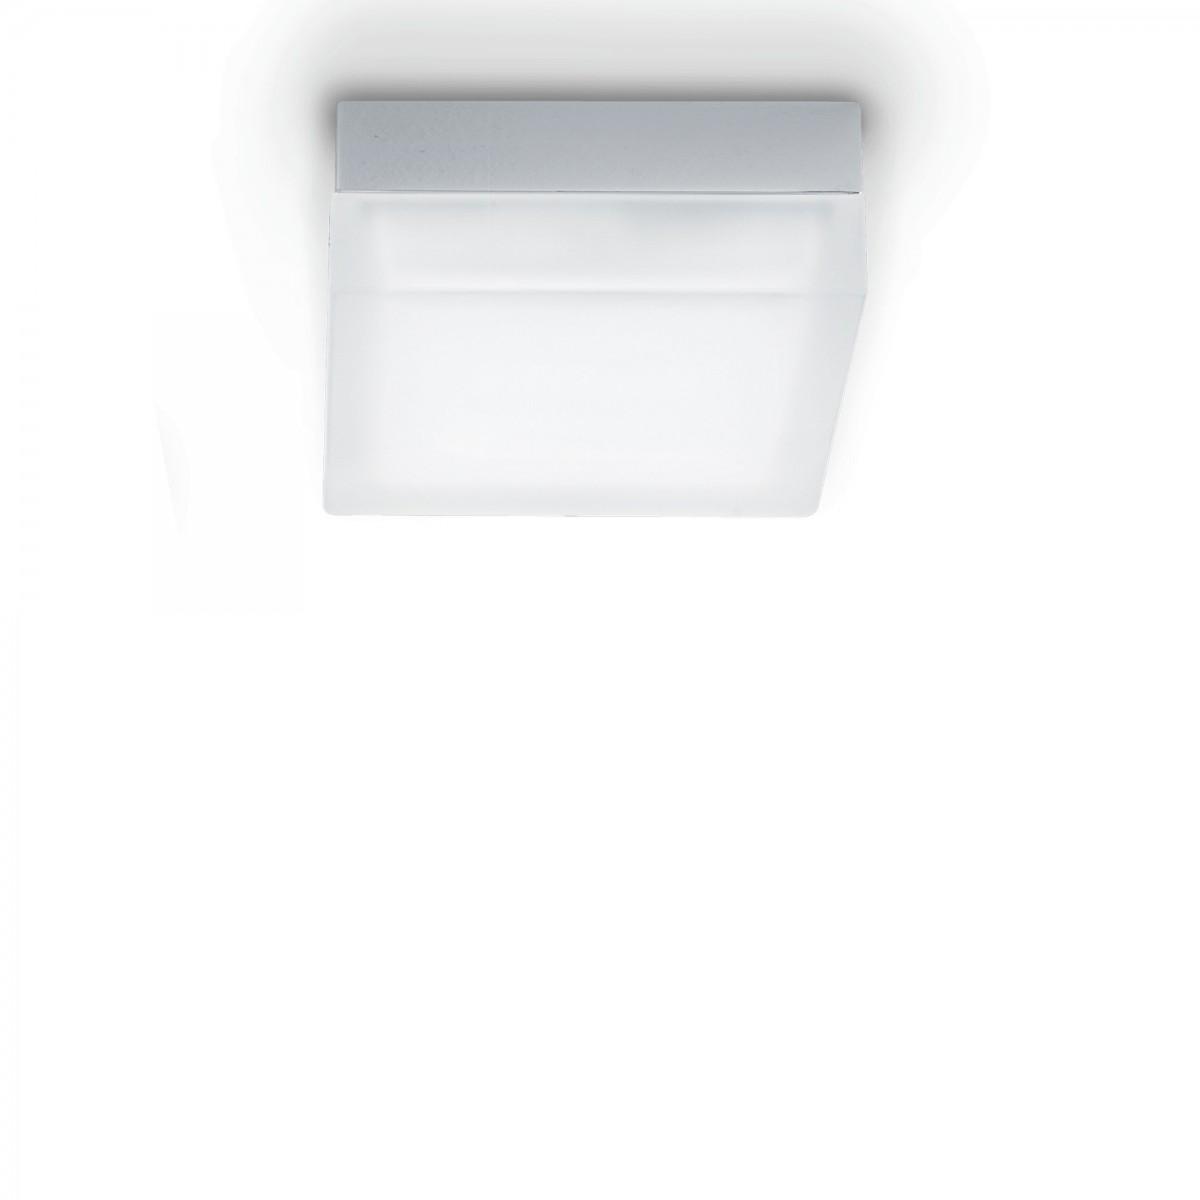 LED stropní svítidlo Ideal lux Iris PL1 104539 1x7W GX53 - jednoduchá elegance